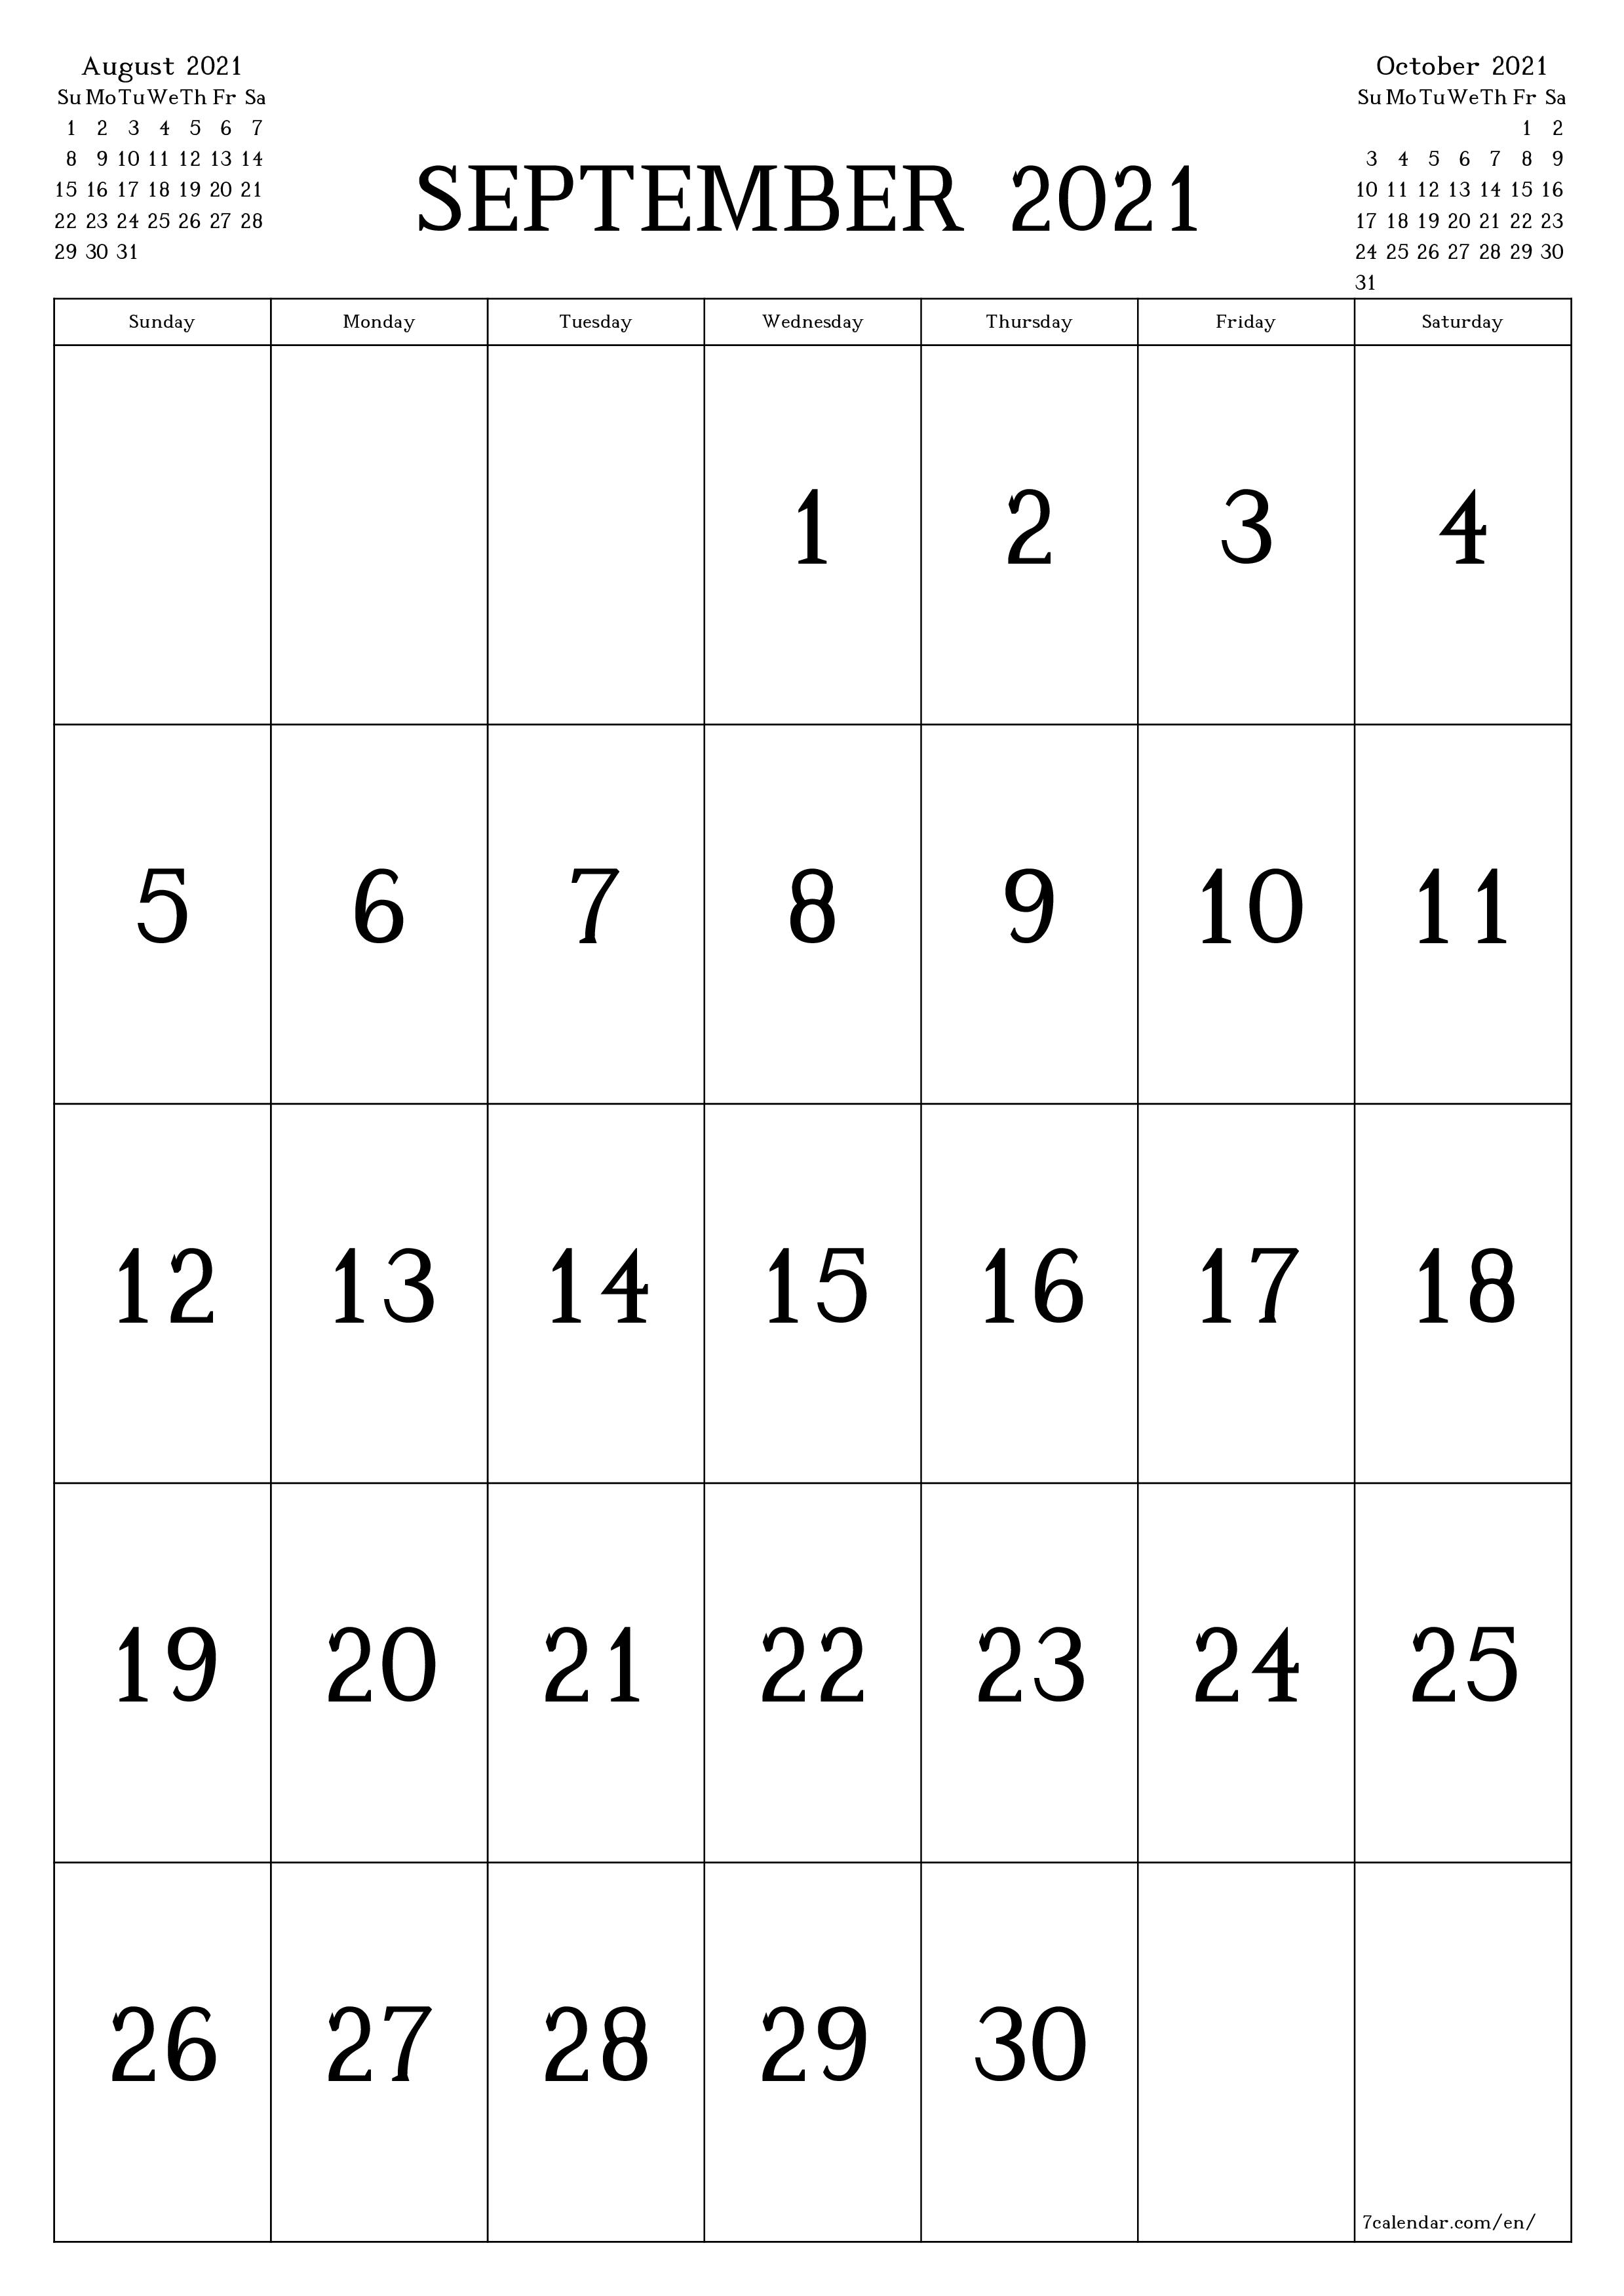 2021 September Calendar to Print